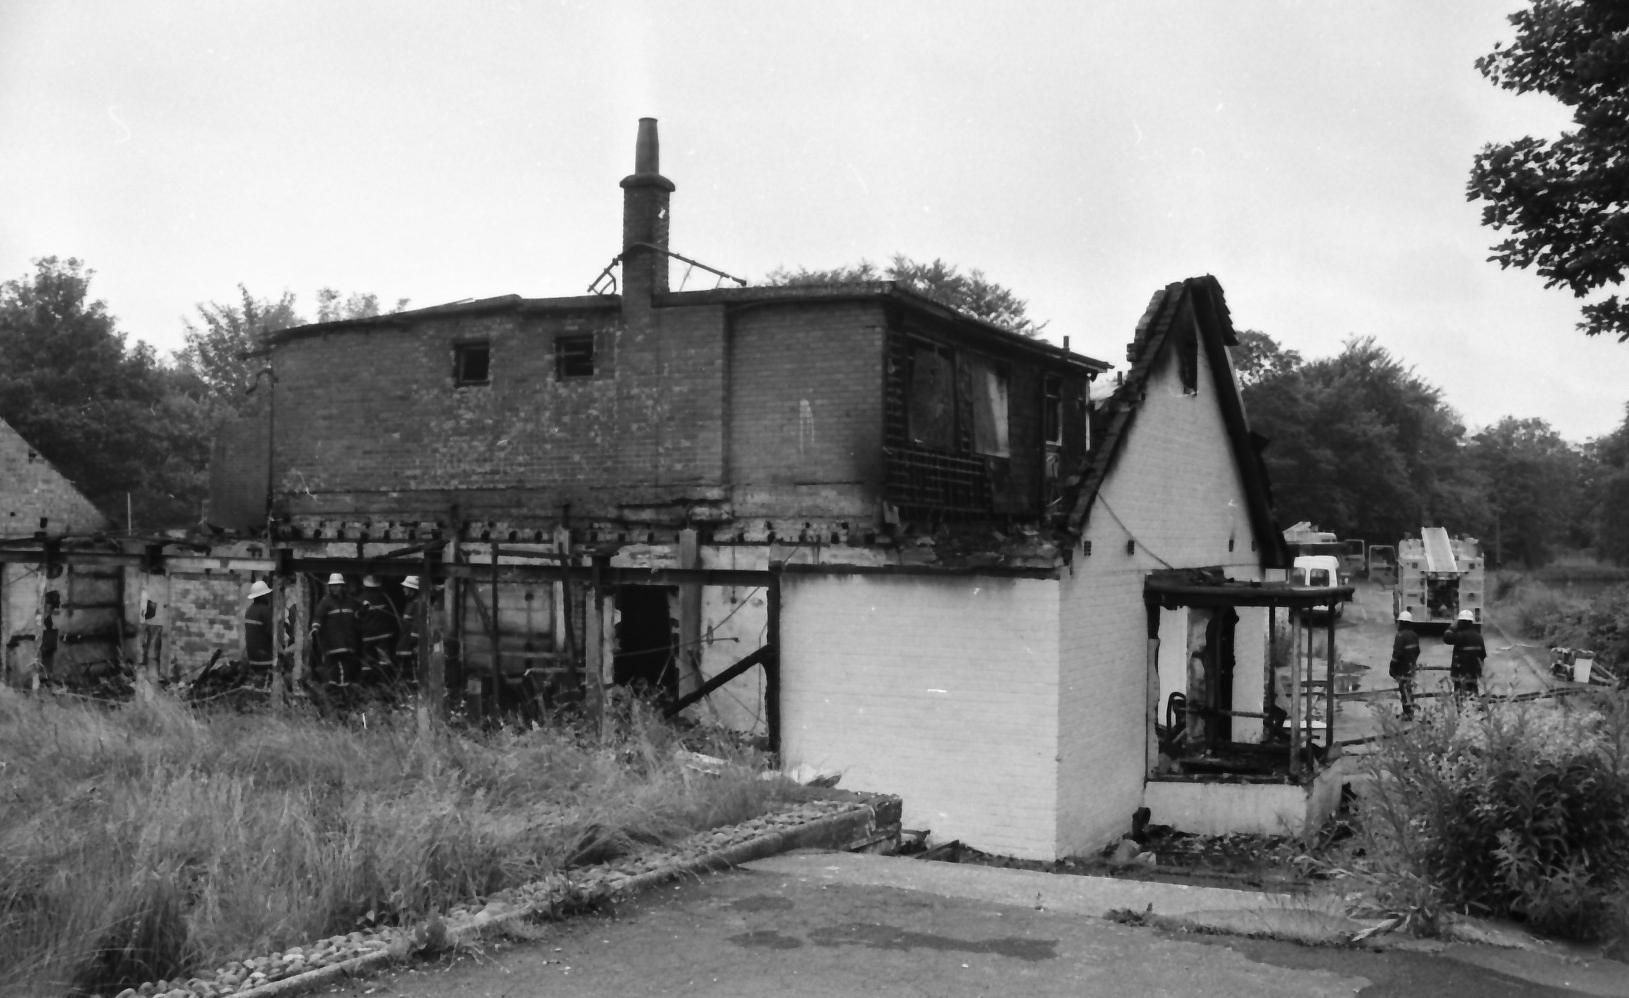 Burnley Miner's Club Fire 1993